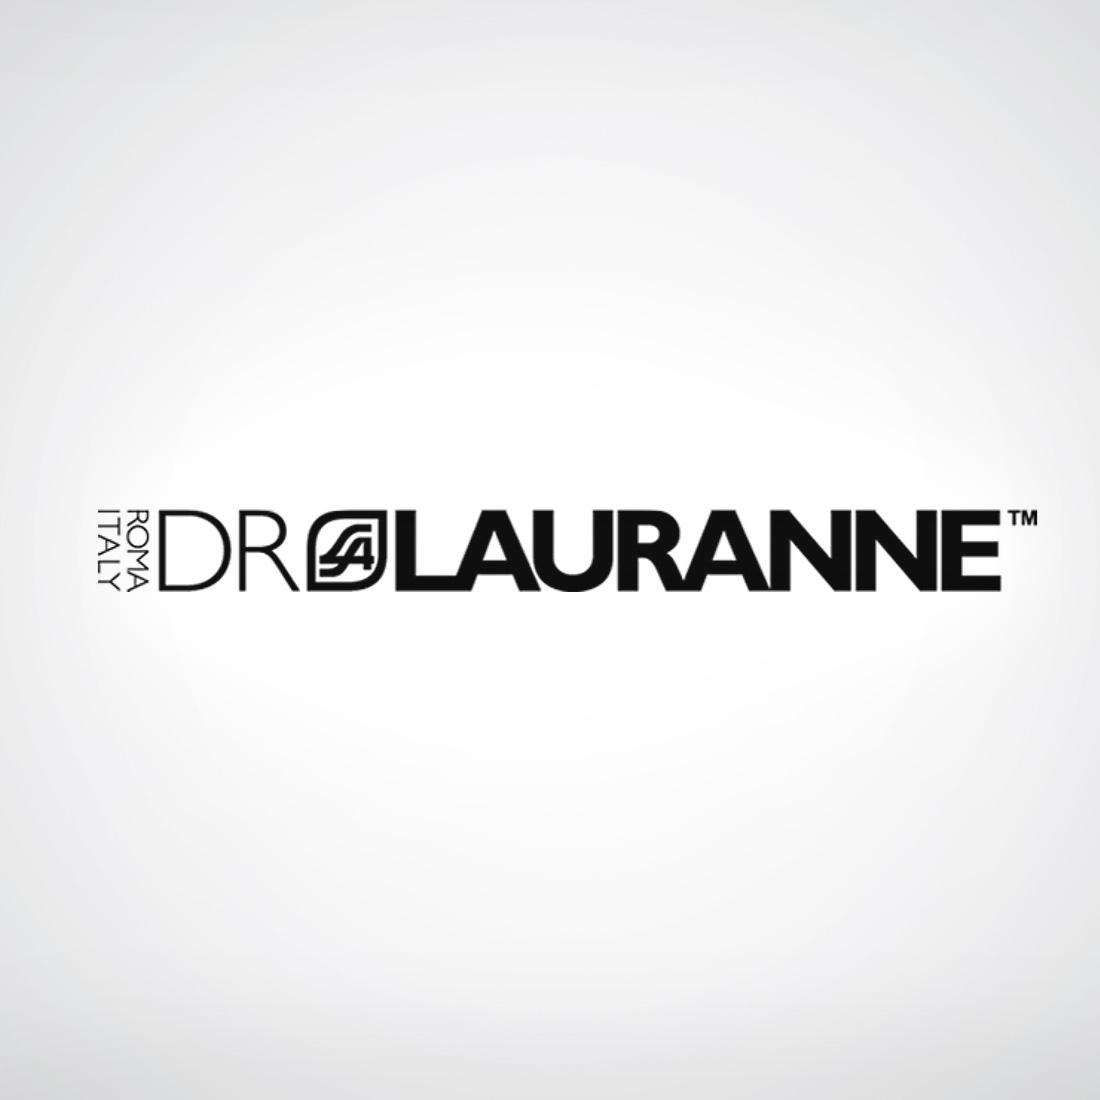 DrLauranne logo su sfondo grigio